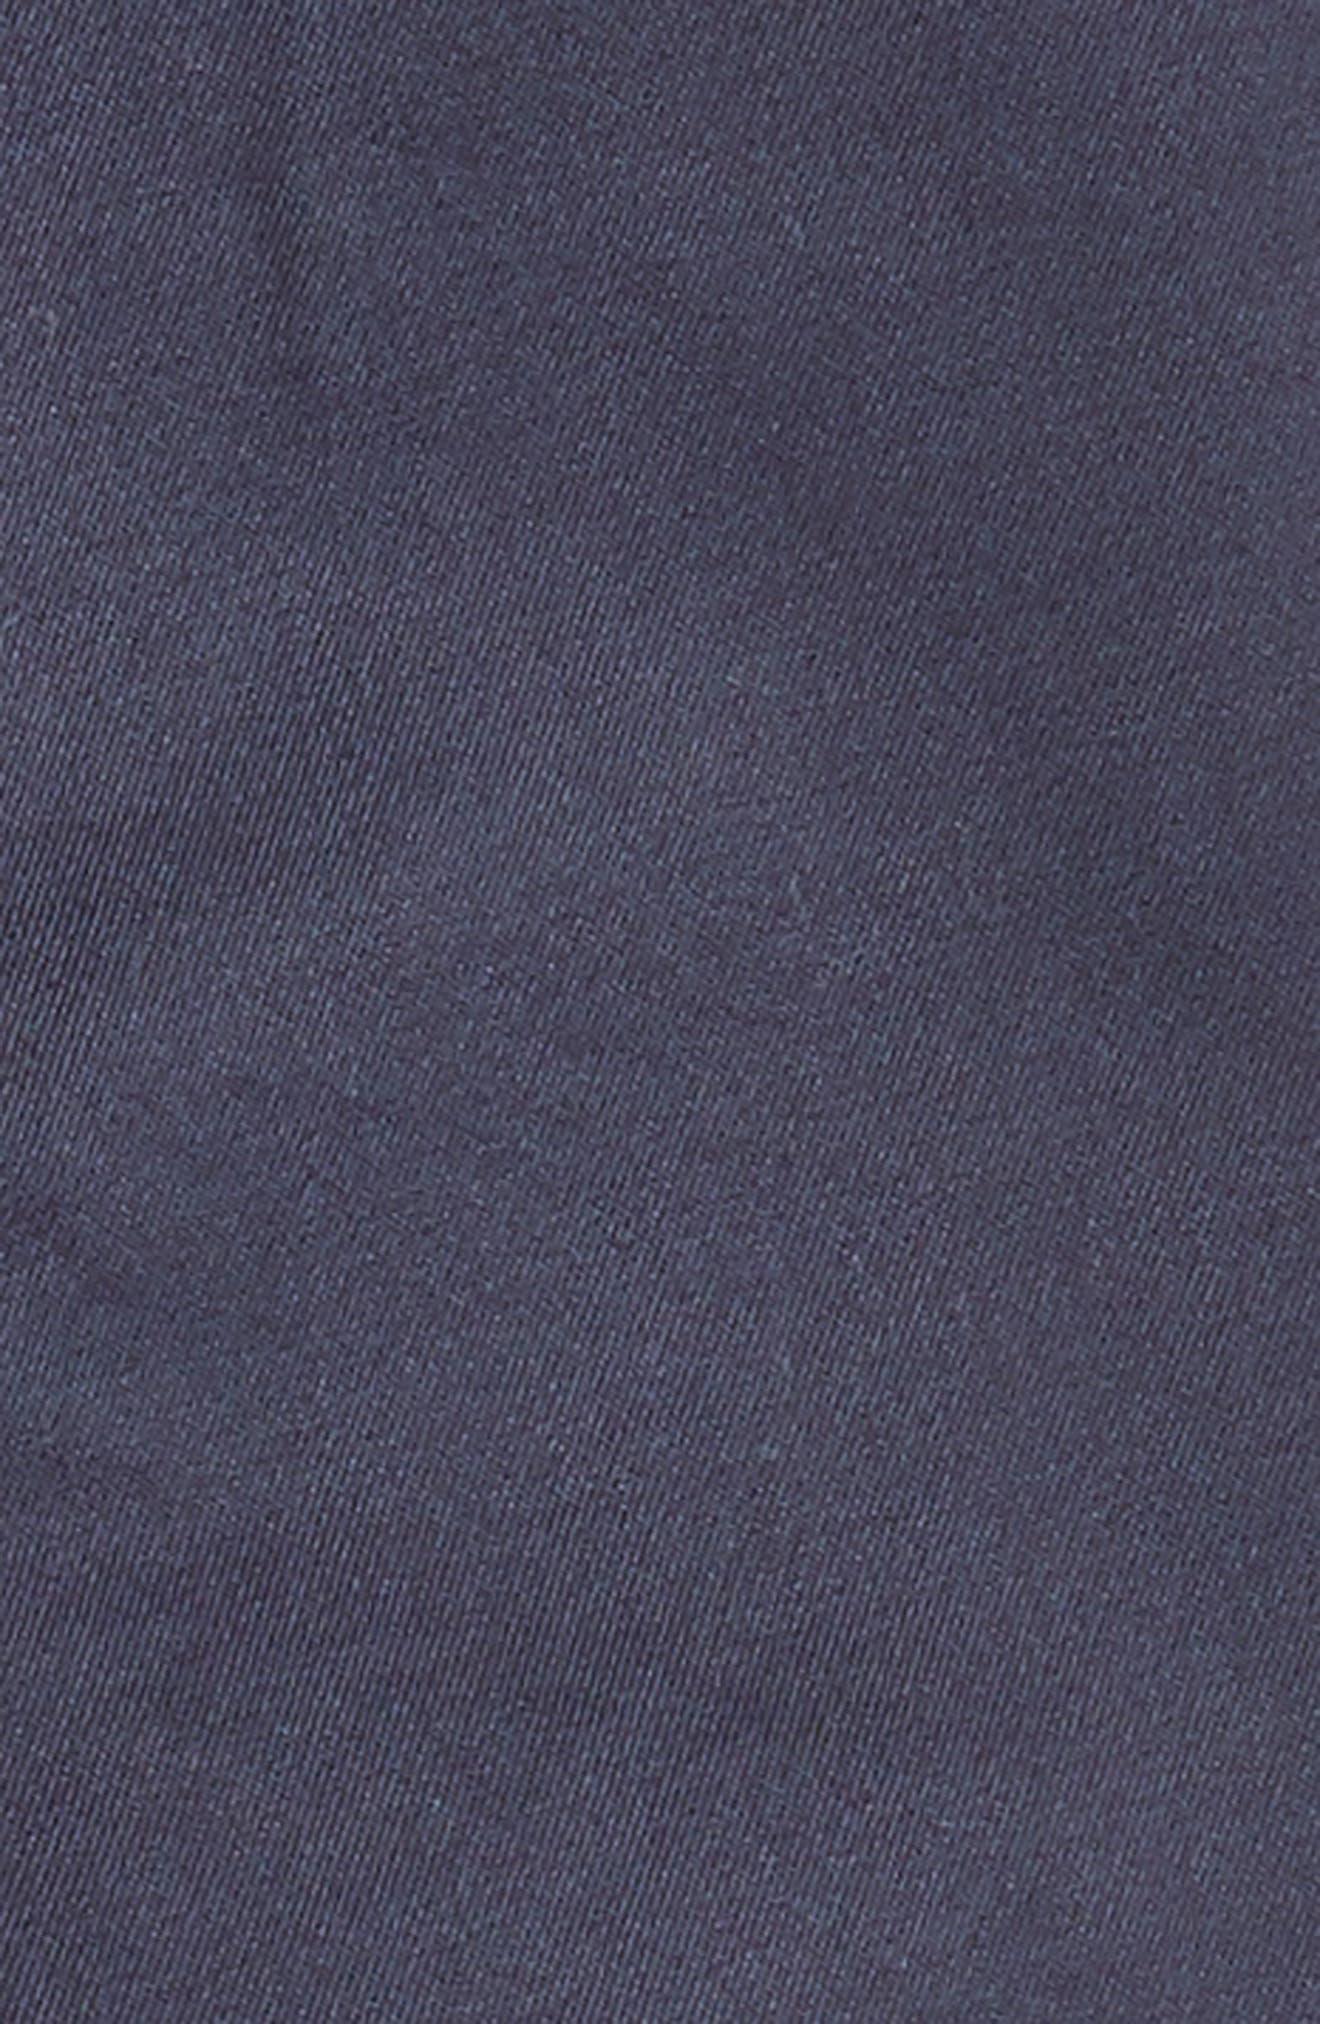 Cotton Twill Jogger Pants,                             Alternate thumbnail 3, color,                             Navy